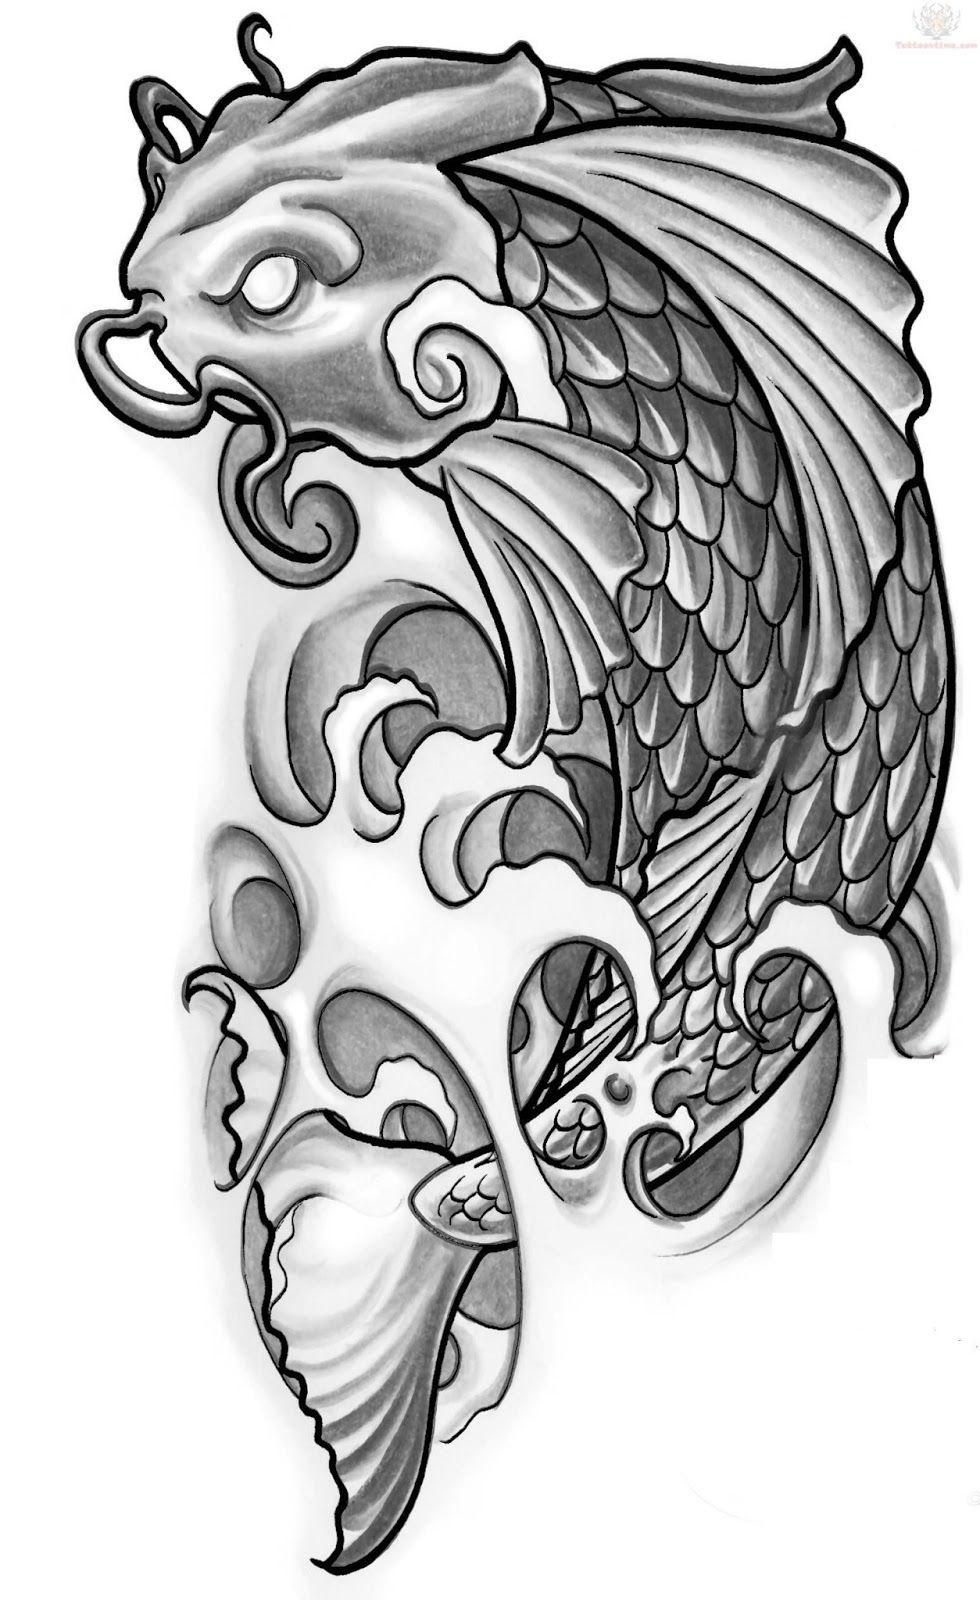 Courage koi tattoo designg 9801600 pinterest tattoos courage koi tattoo designg 9801600 izmirmasajfo